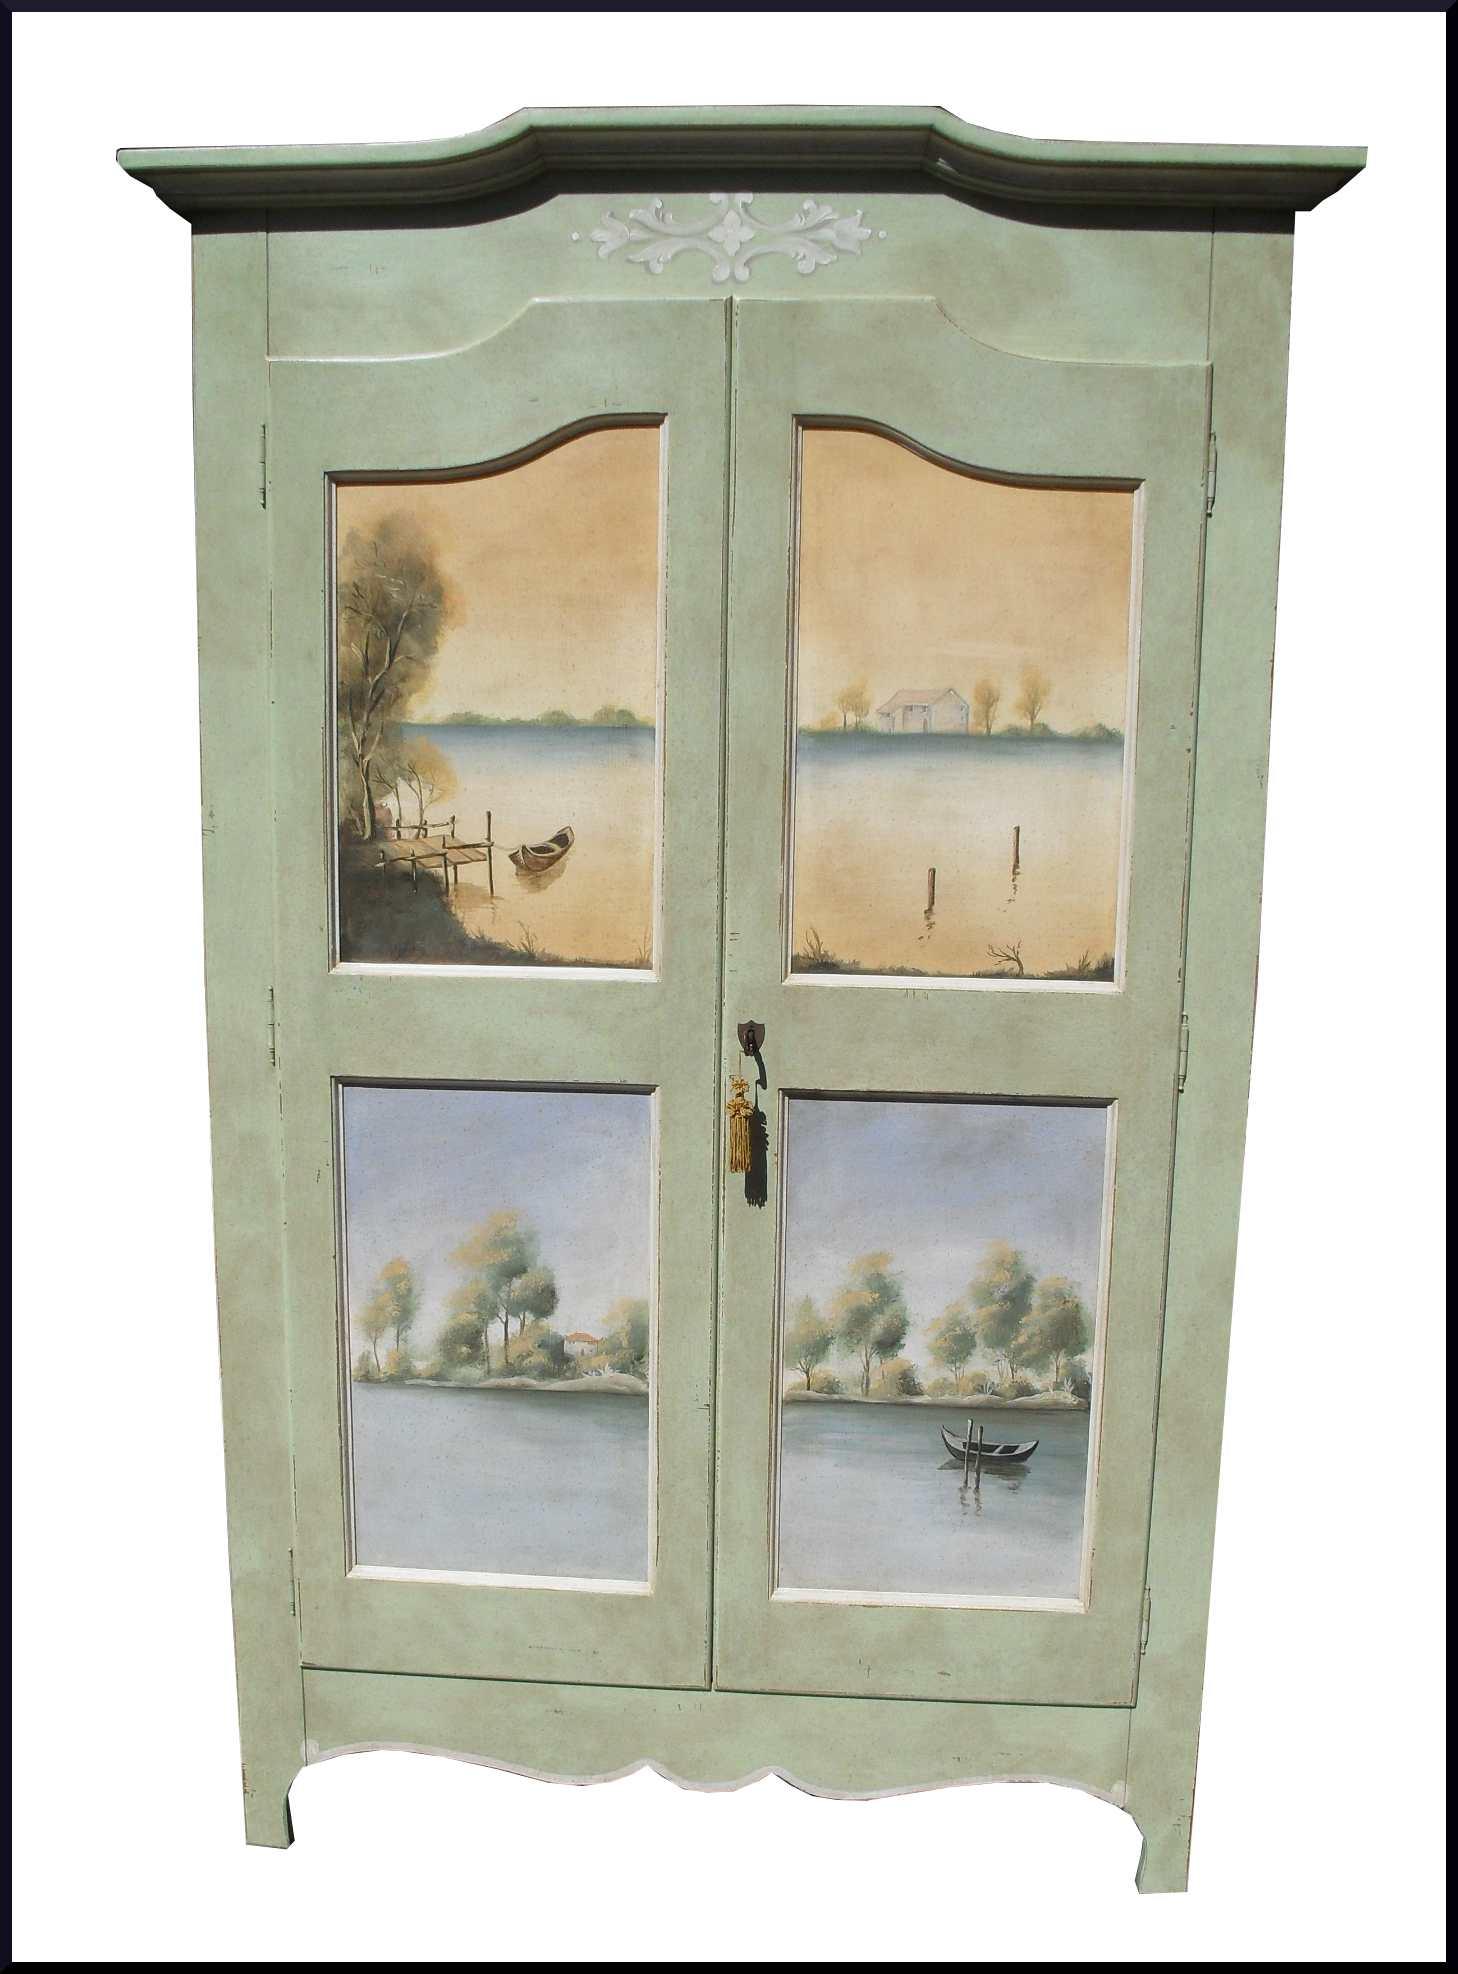 Armadio dipinto e decorato a mano con paesaggi la - Mobili dipinti tirolesi ...